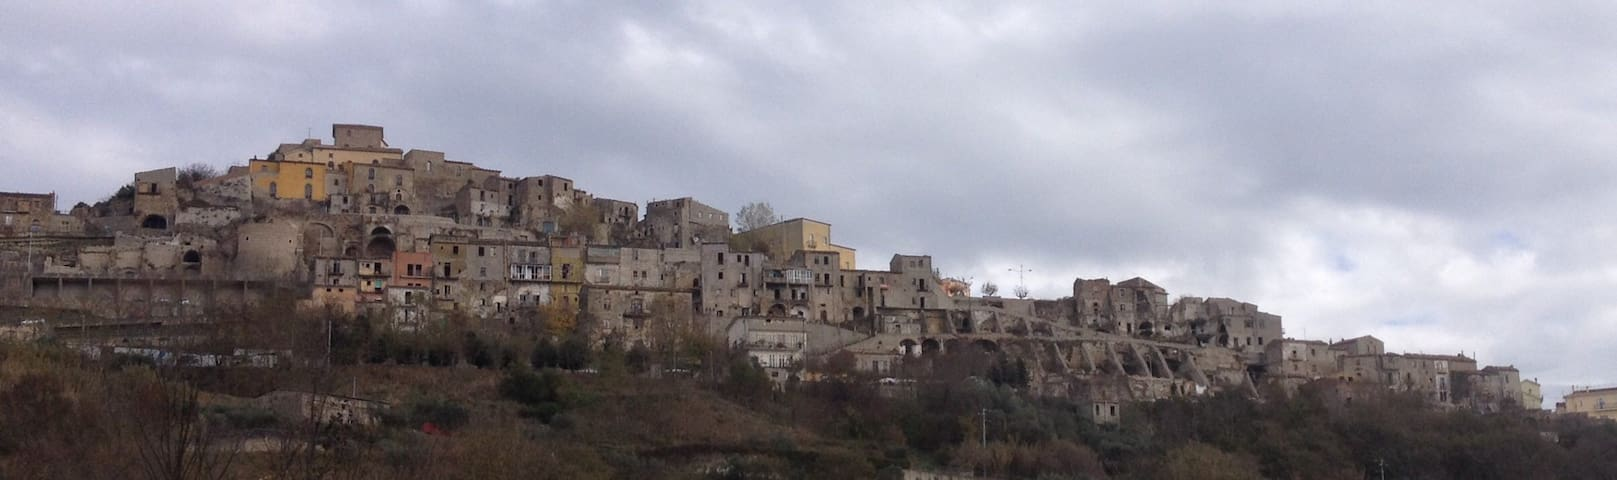 Medieval Village Apartment w/Balcony - Calitri - Apartmen